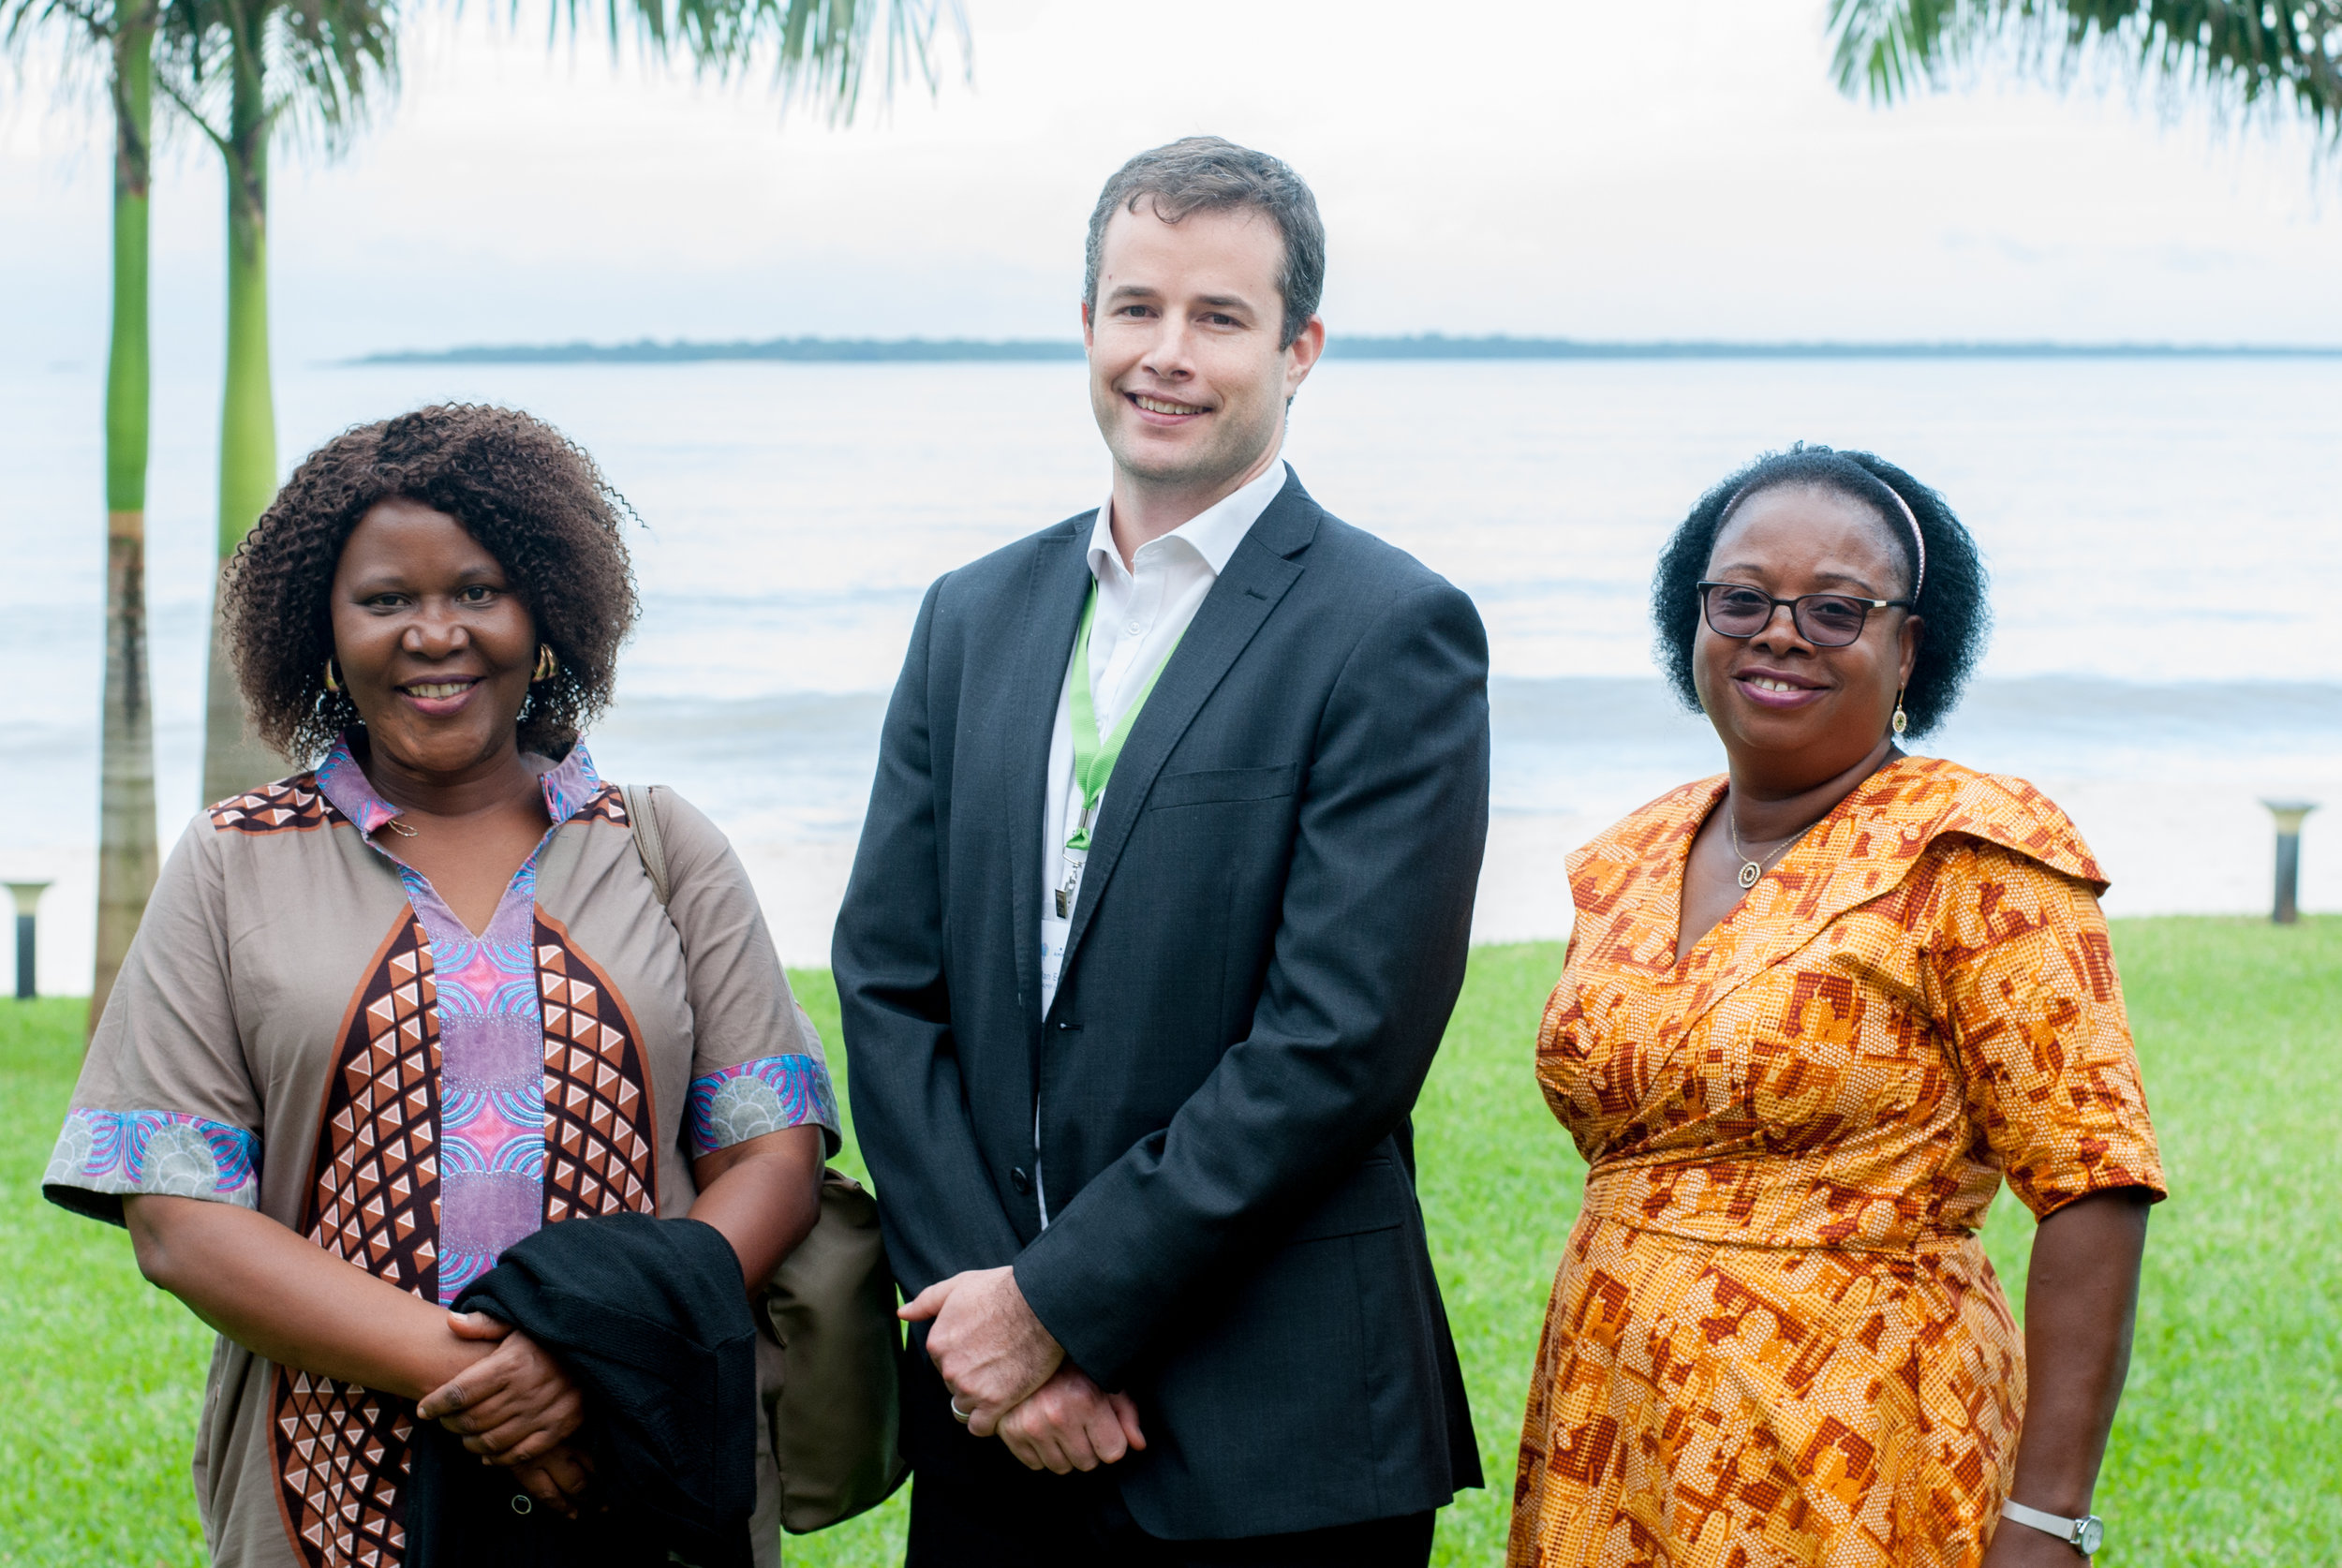 Members of the new Zambia Community Health Team. (From left to right) Dr. Sylvia Chila Simwanza, Dylan Edwards, Rosemary Masilani